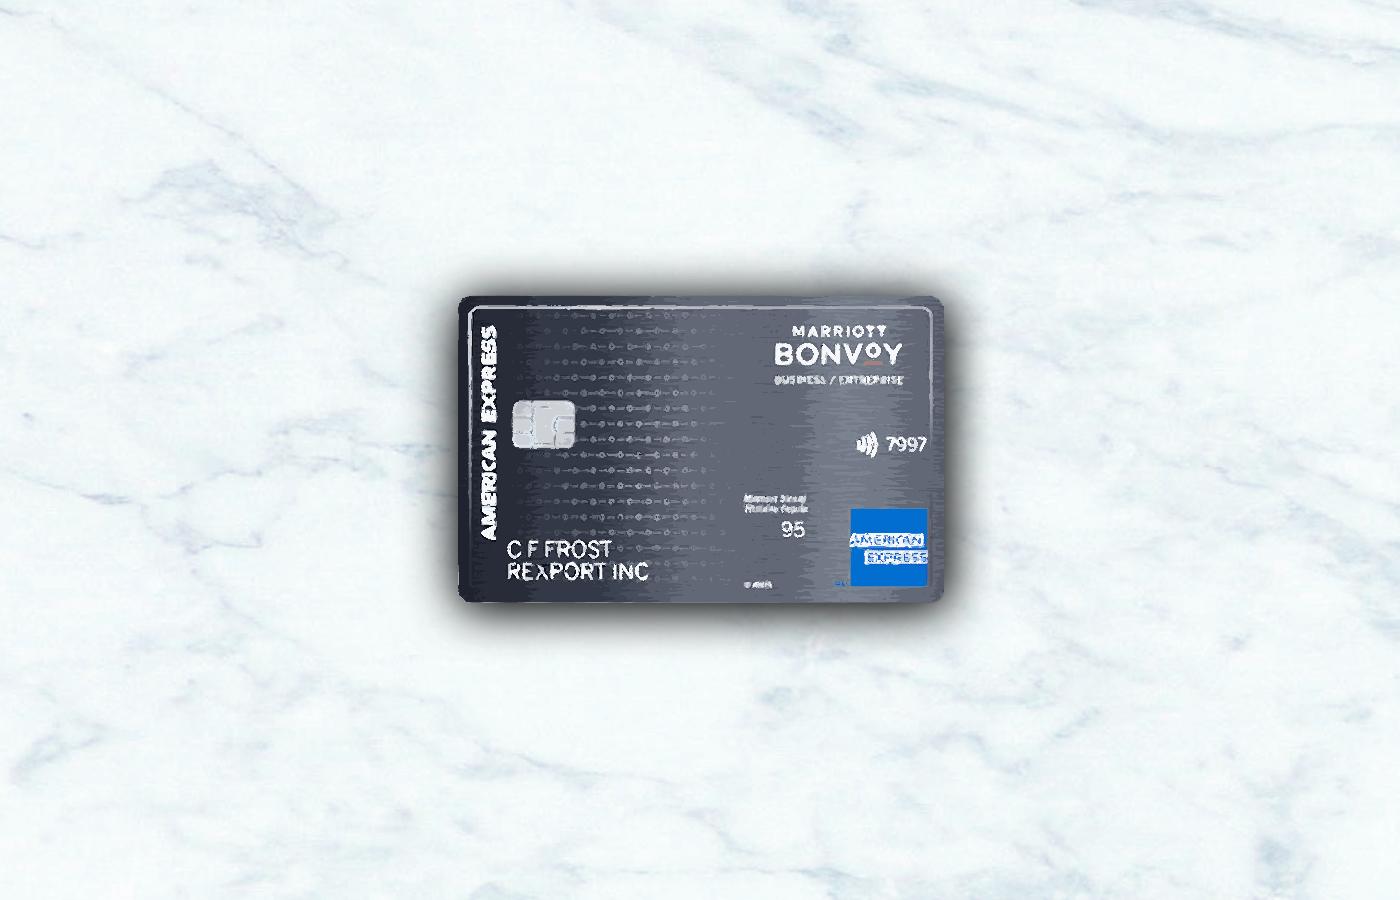 American Express Marriott Bonvoy Business Card | Credit Card